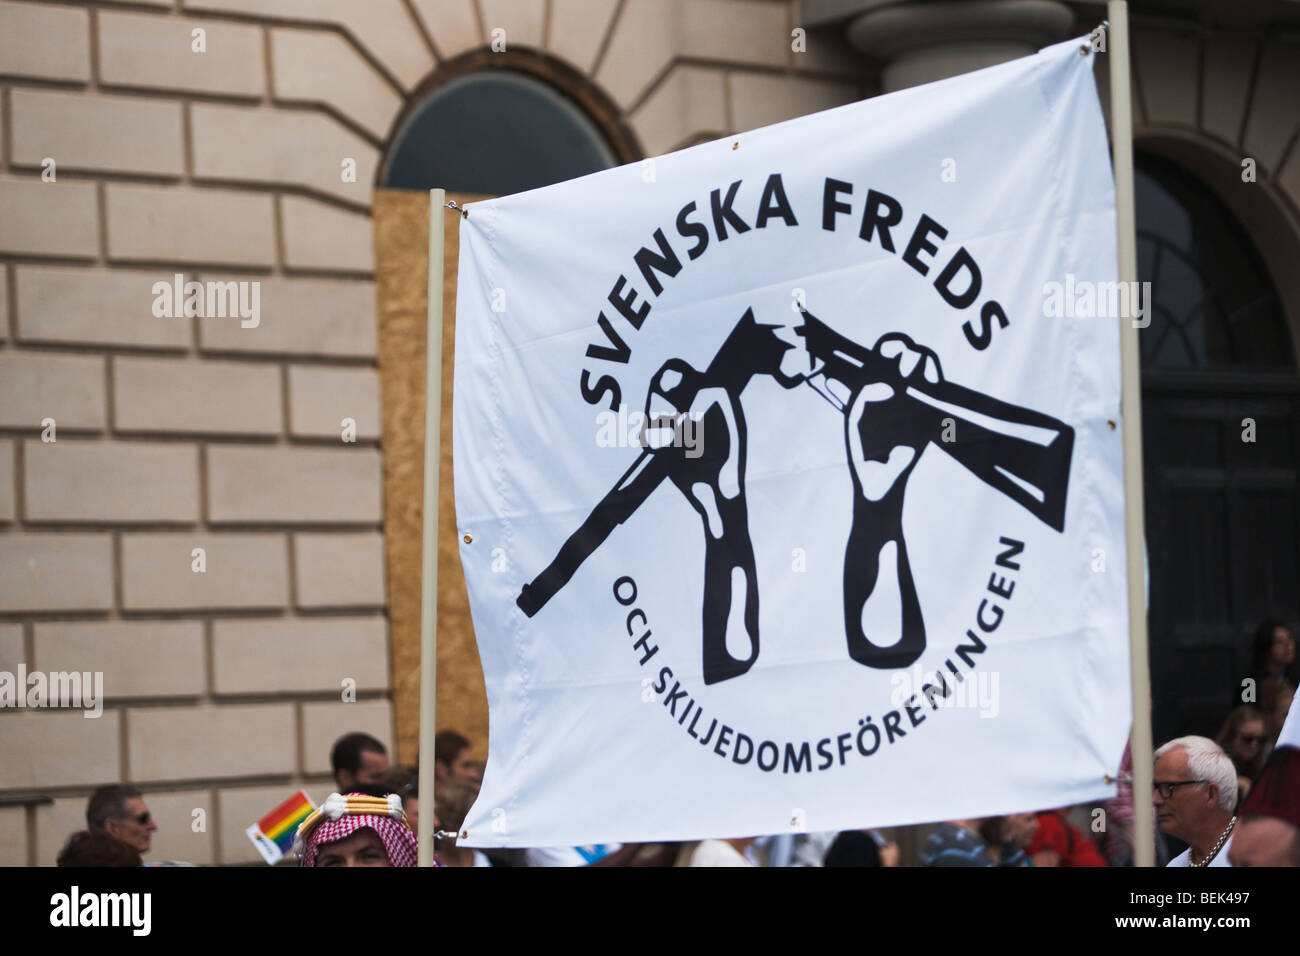 Svenska Freds och Skiljedomsföreningen suédois, mouvement de paix, marchant dans la Stockholm Pride Parade. Photo Stock